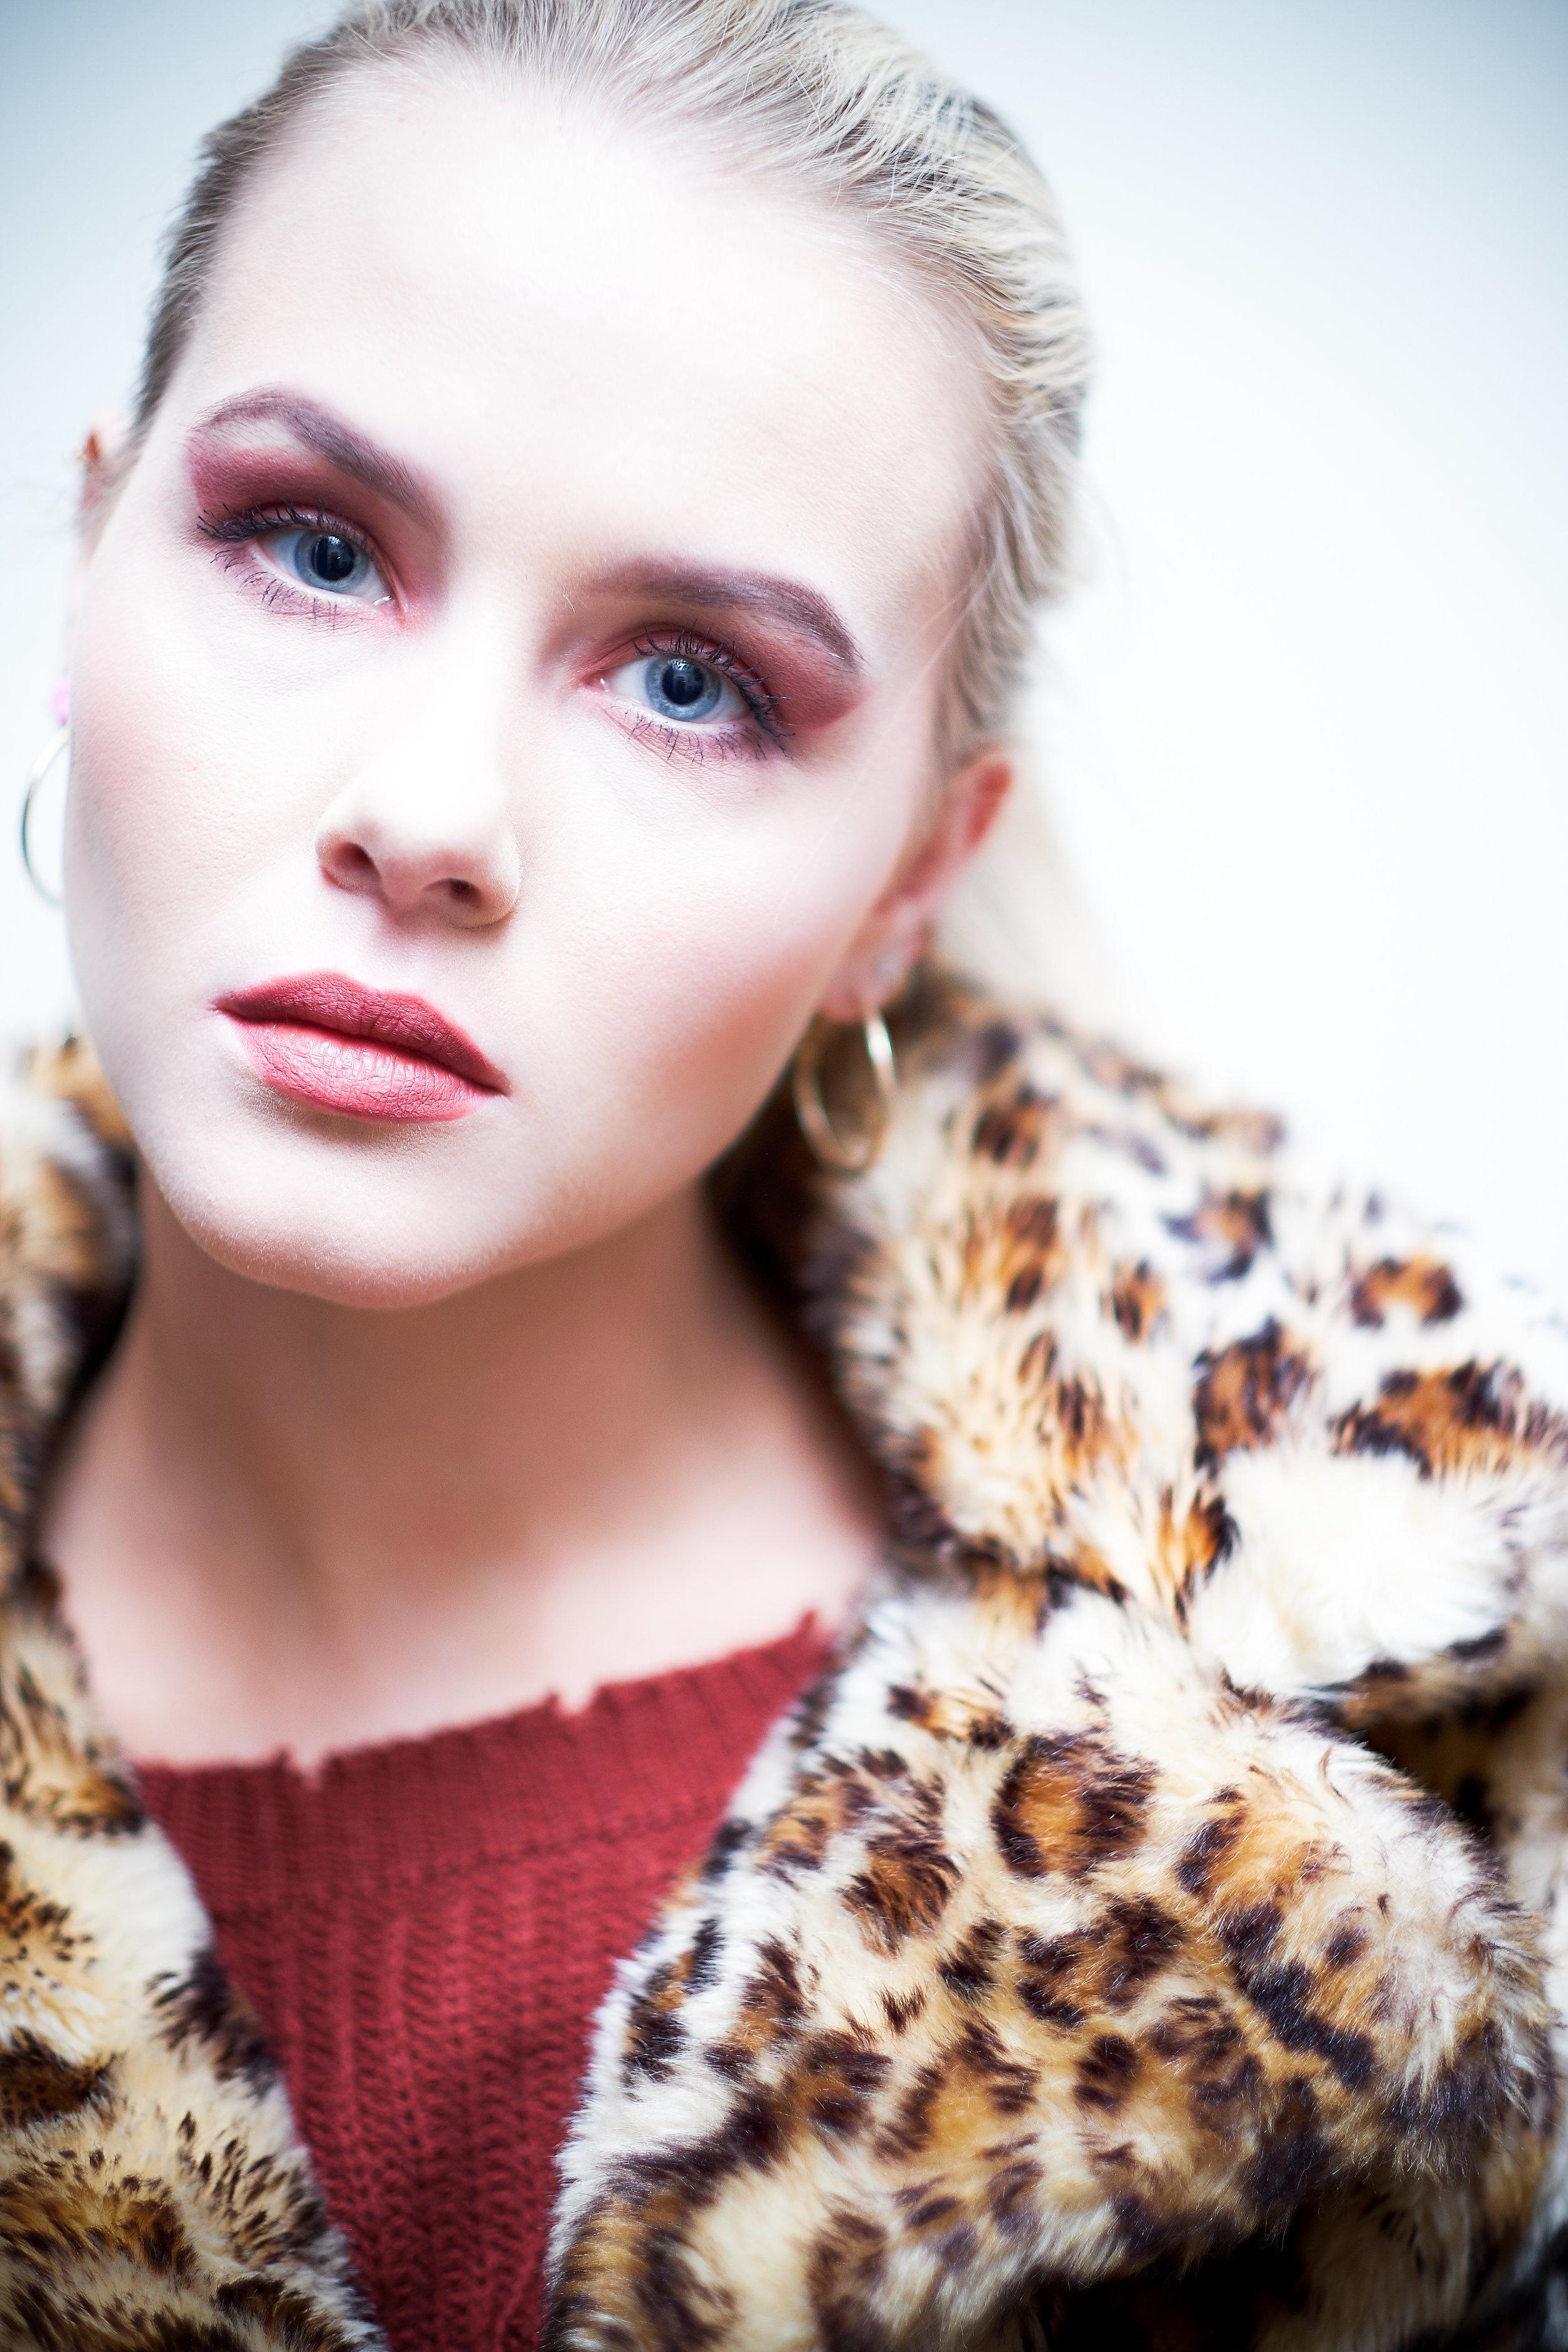 lindesy with makeup-19.jpg